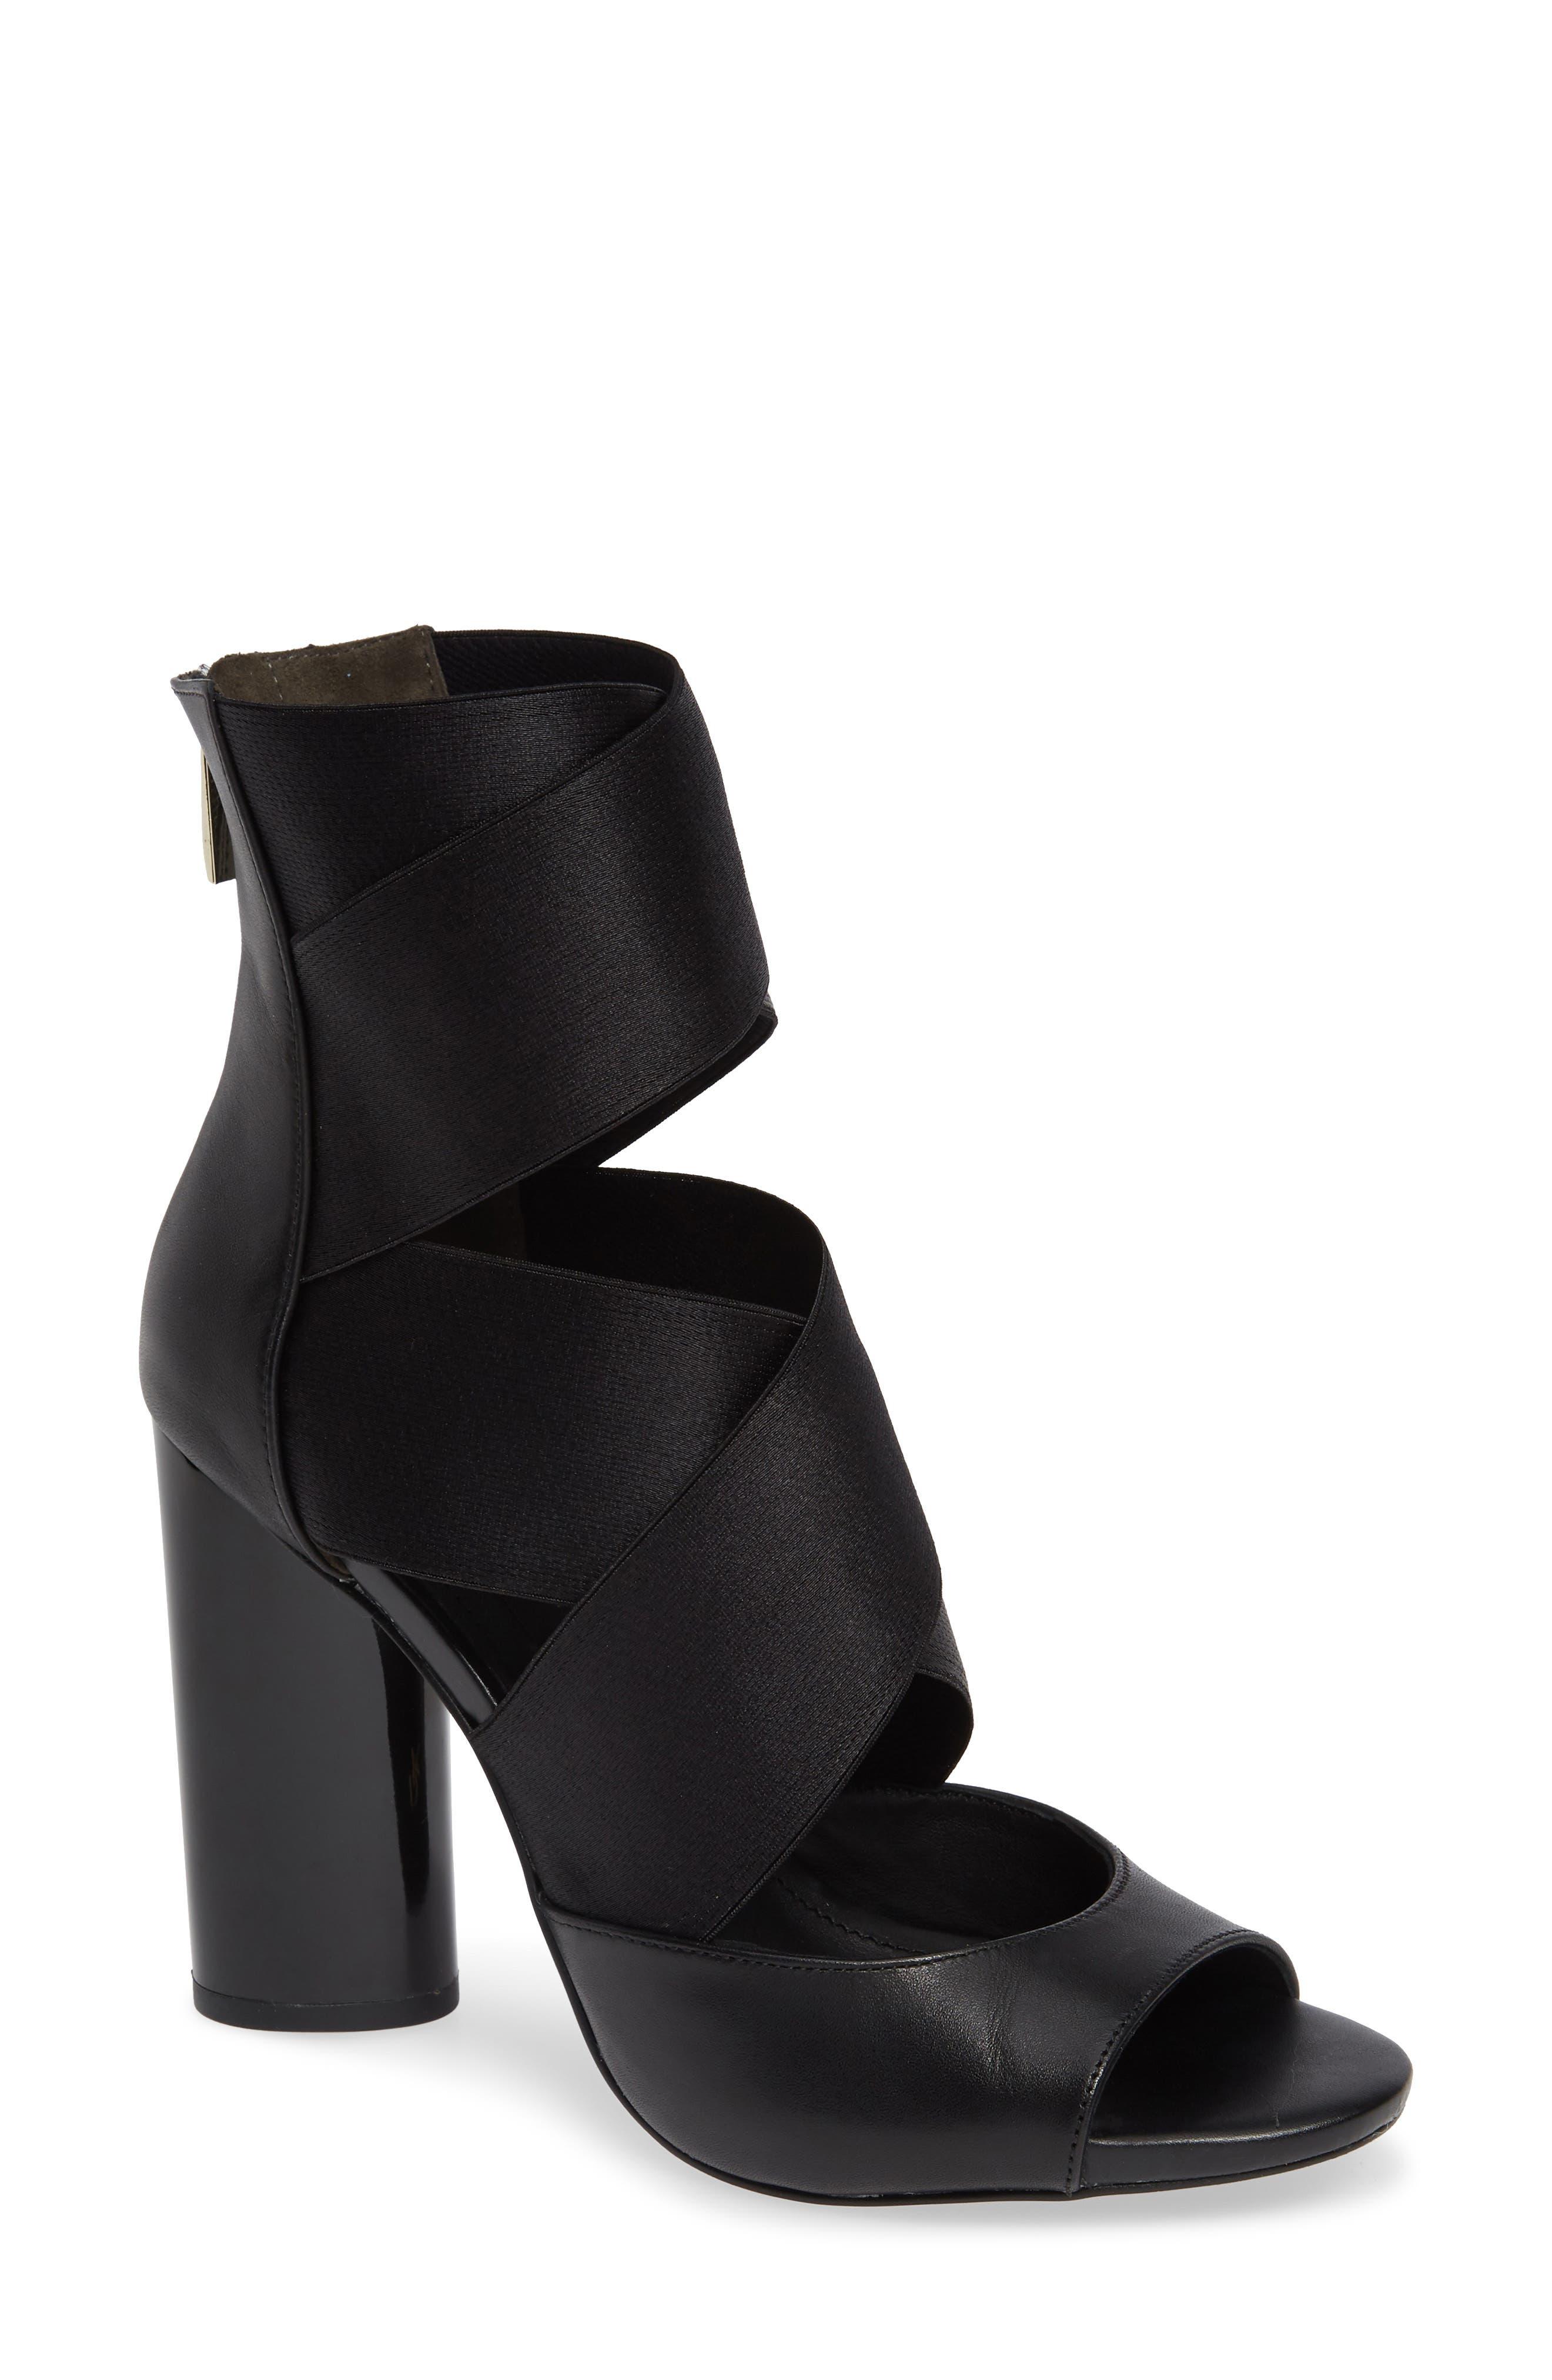 Donna Karan Briana Strappy High Sandal,                         Main,                         color, BLACK CALF SHINY SATIN ELASTIC